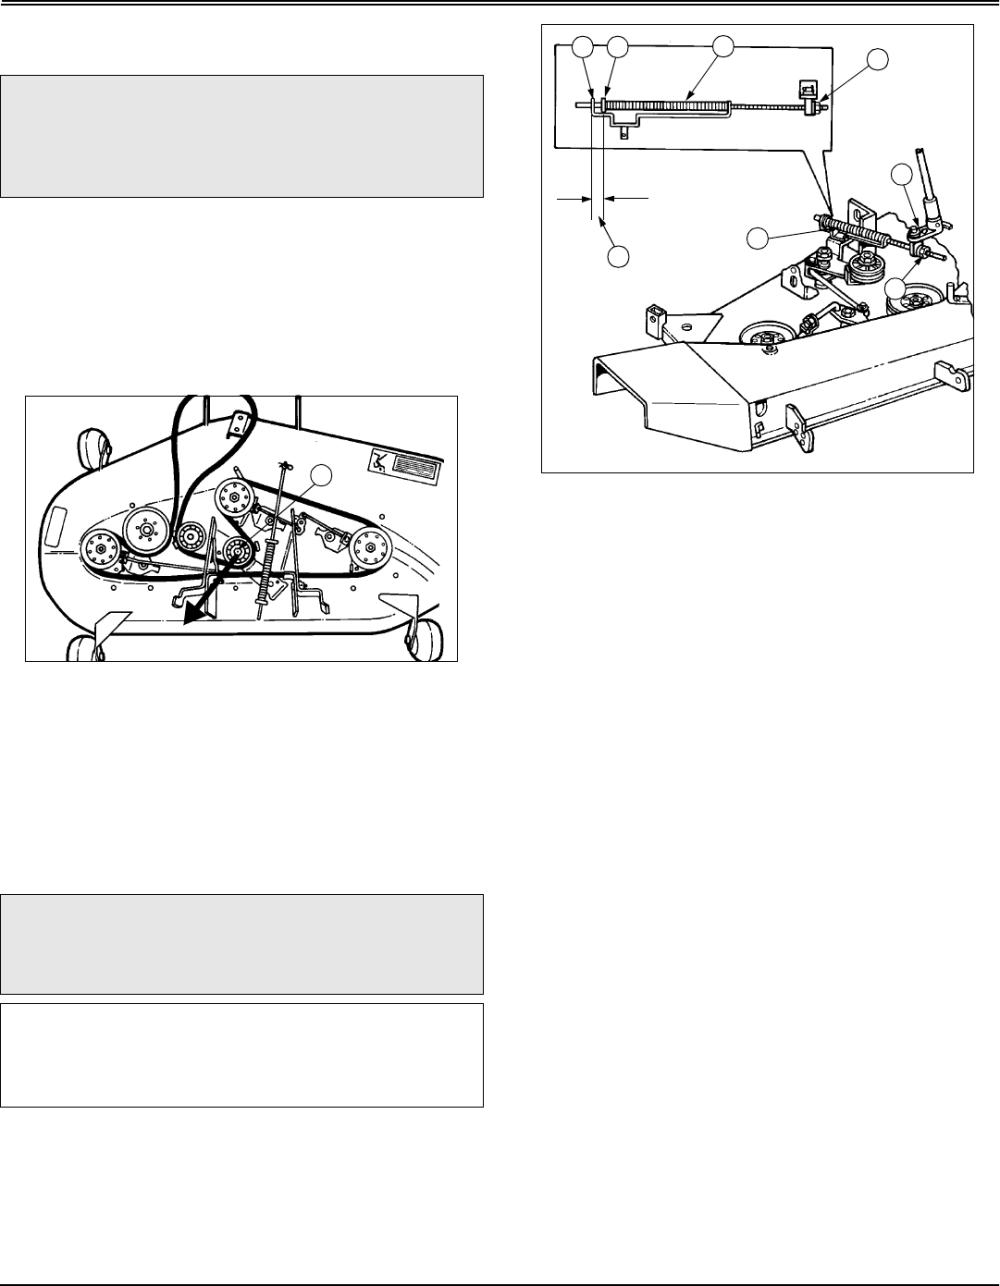 medium resolution of scotts s2546 lawn mower user manual